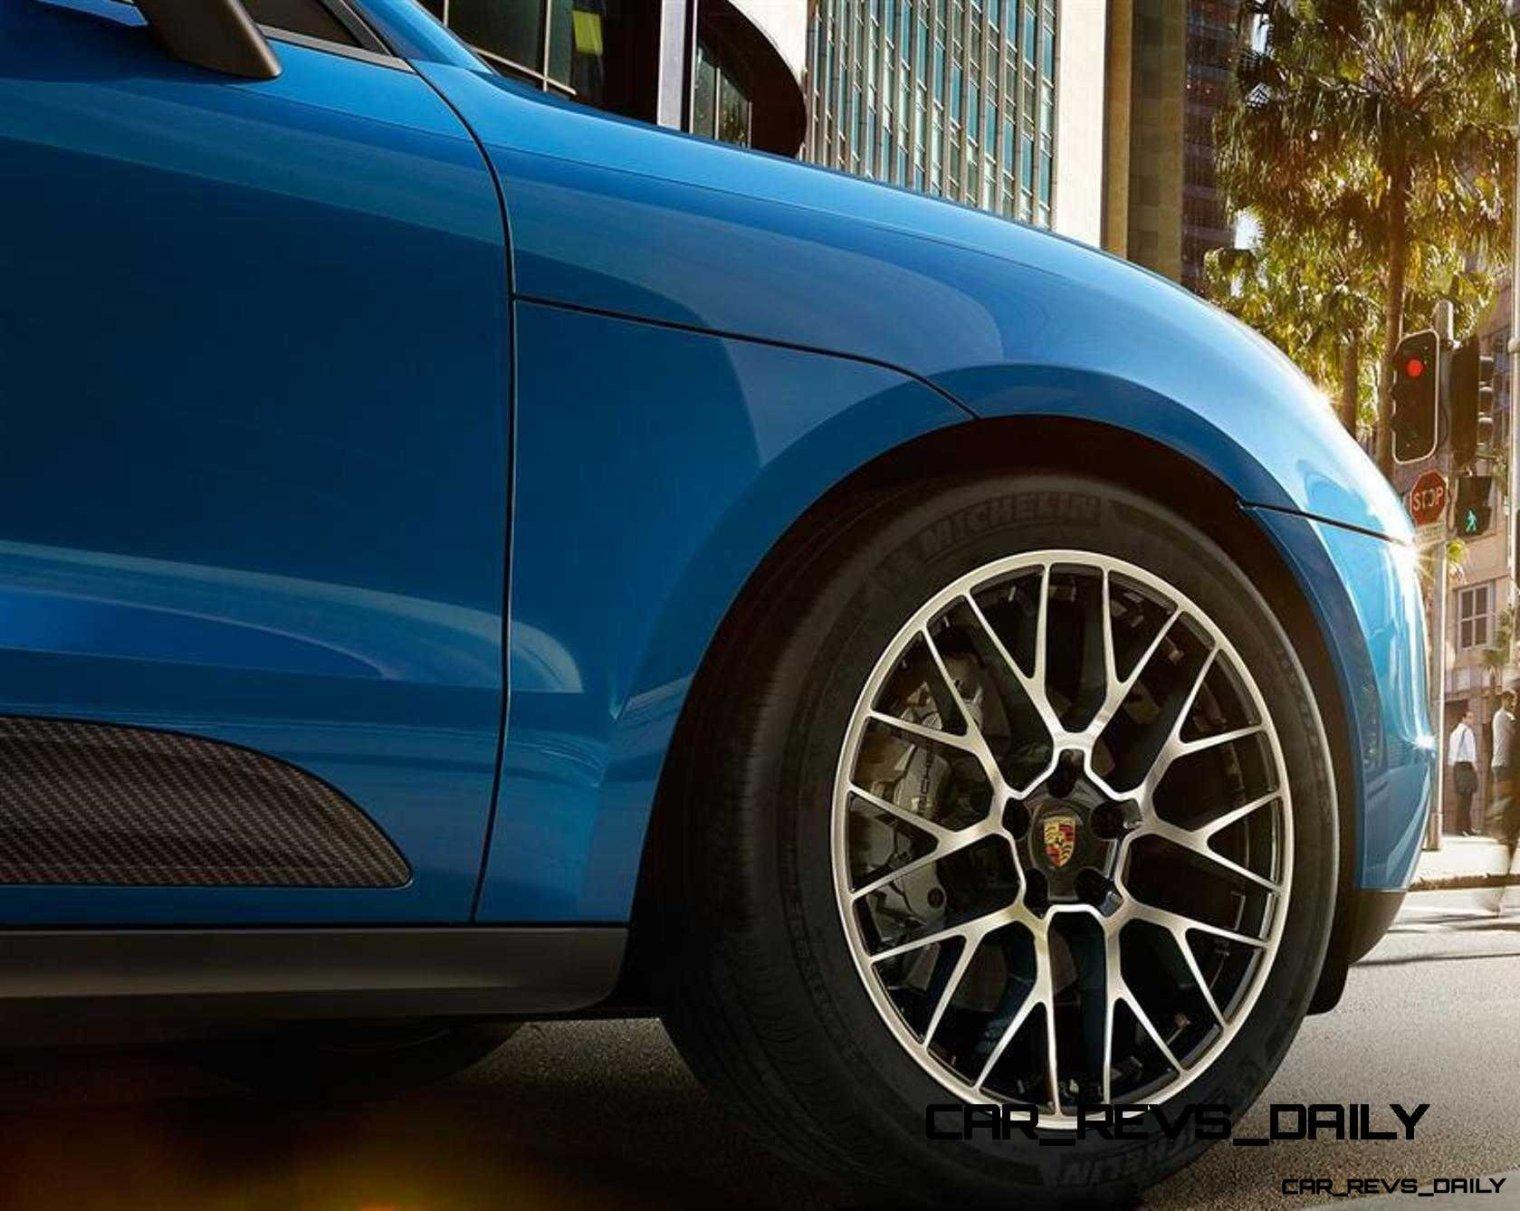 2015 Porsche Macan - Latest Images - CarRevsDaily.com 51